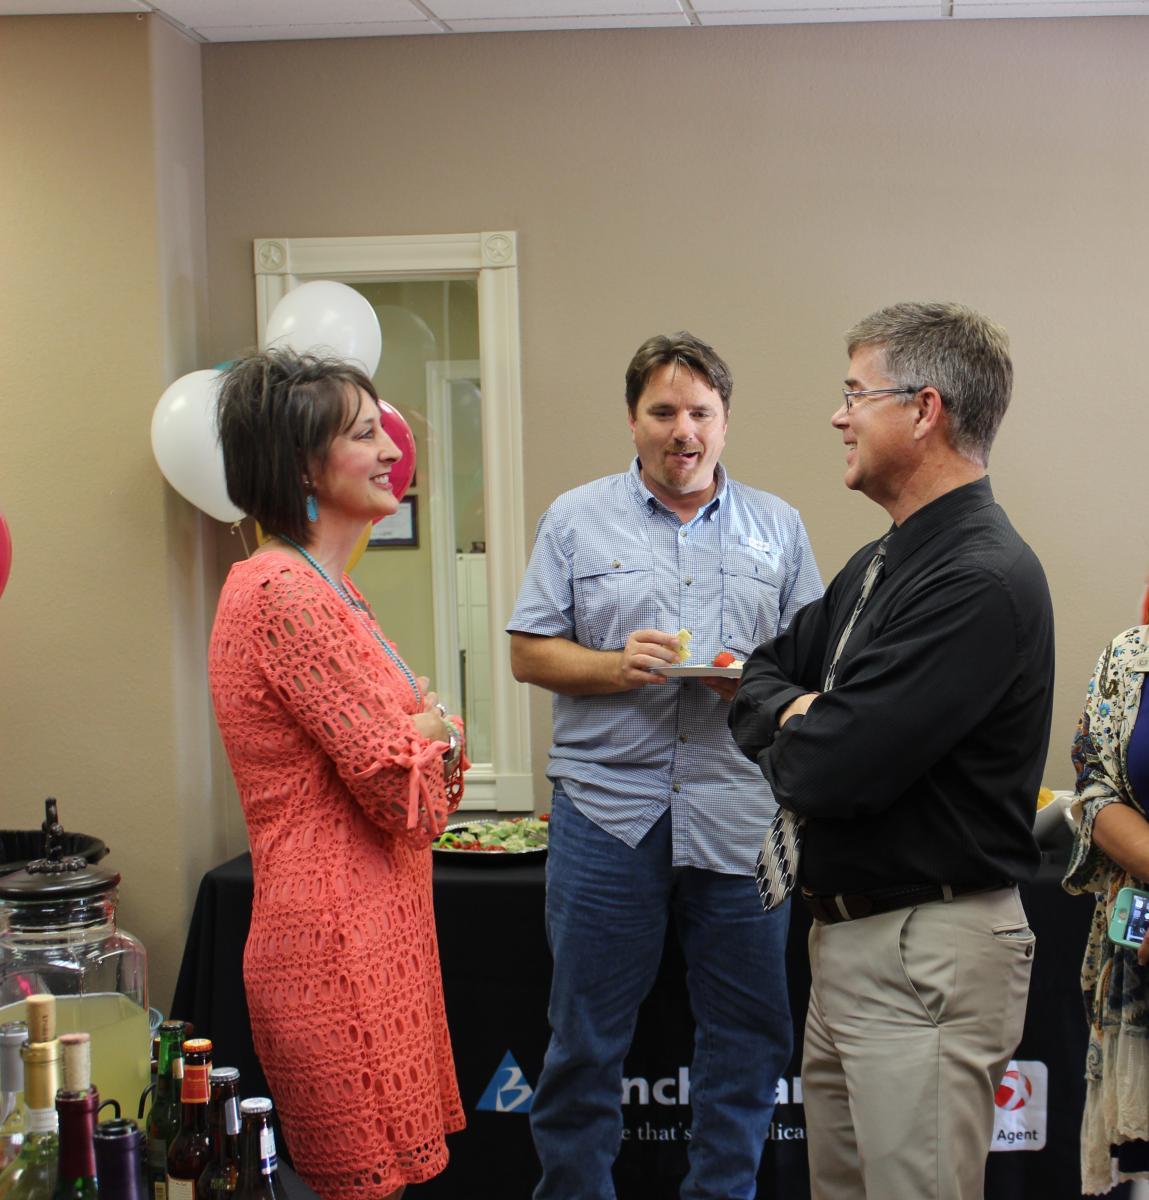 Lora Cheney and guests at Burnet Ribbon Cutting